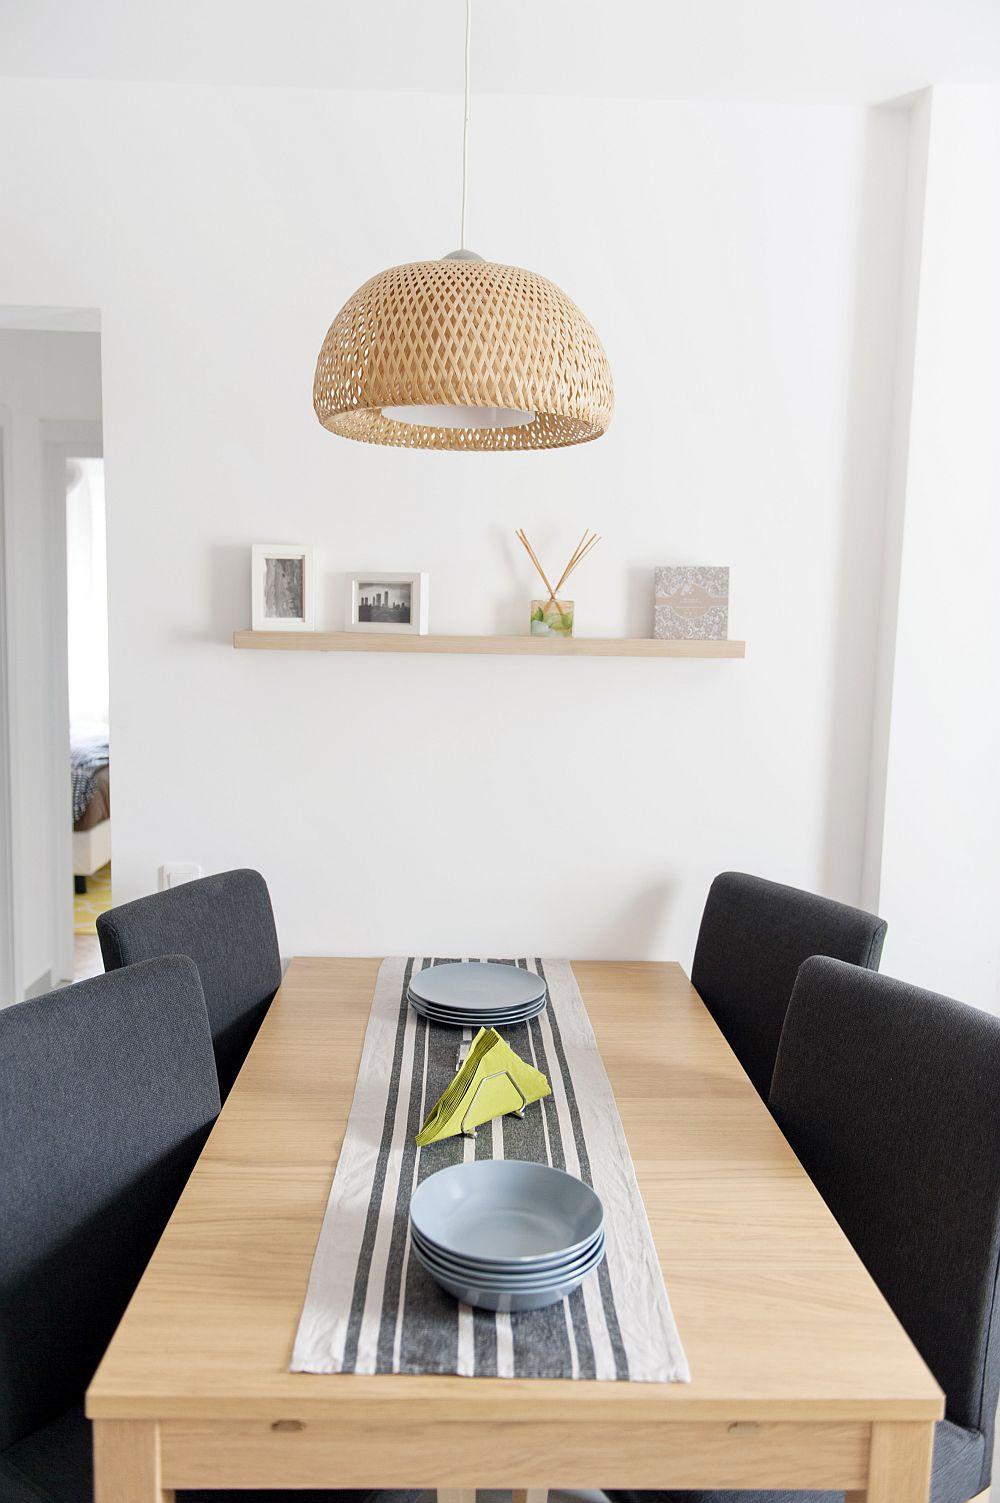 adelaparvu.com despre apartament 3 camere Tg Mures, designer Simona Ungurean (12)